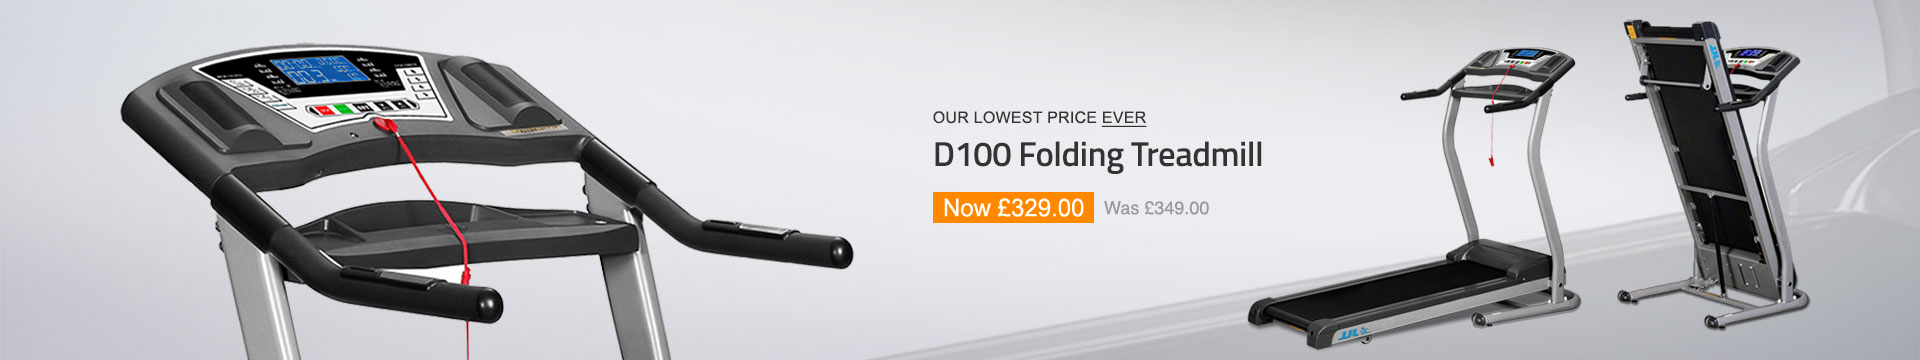 D100 Folding Treadmill